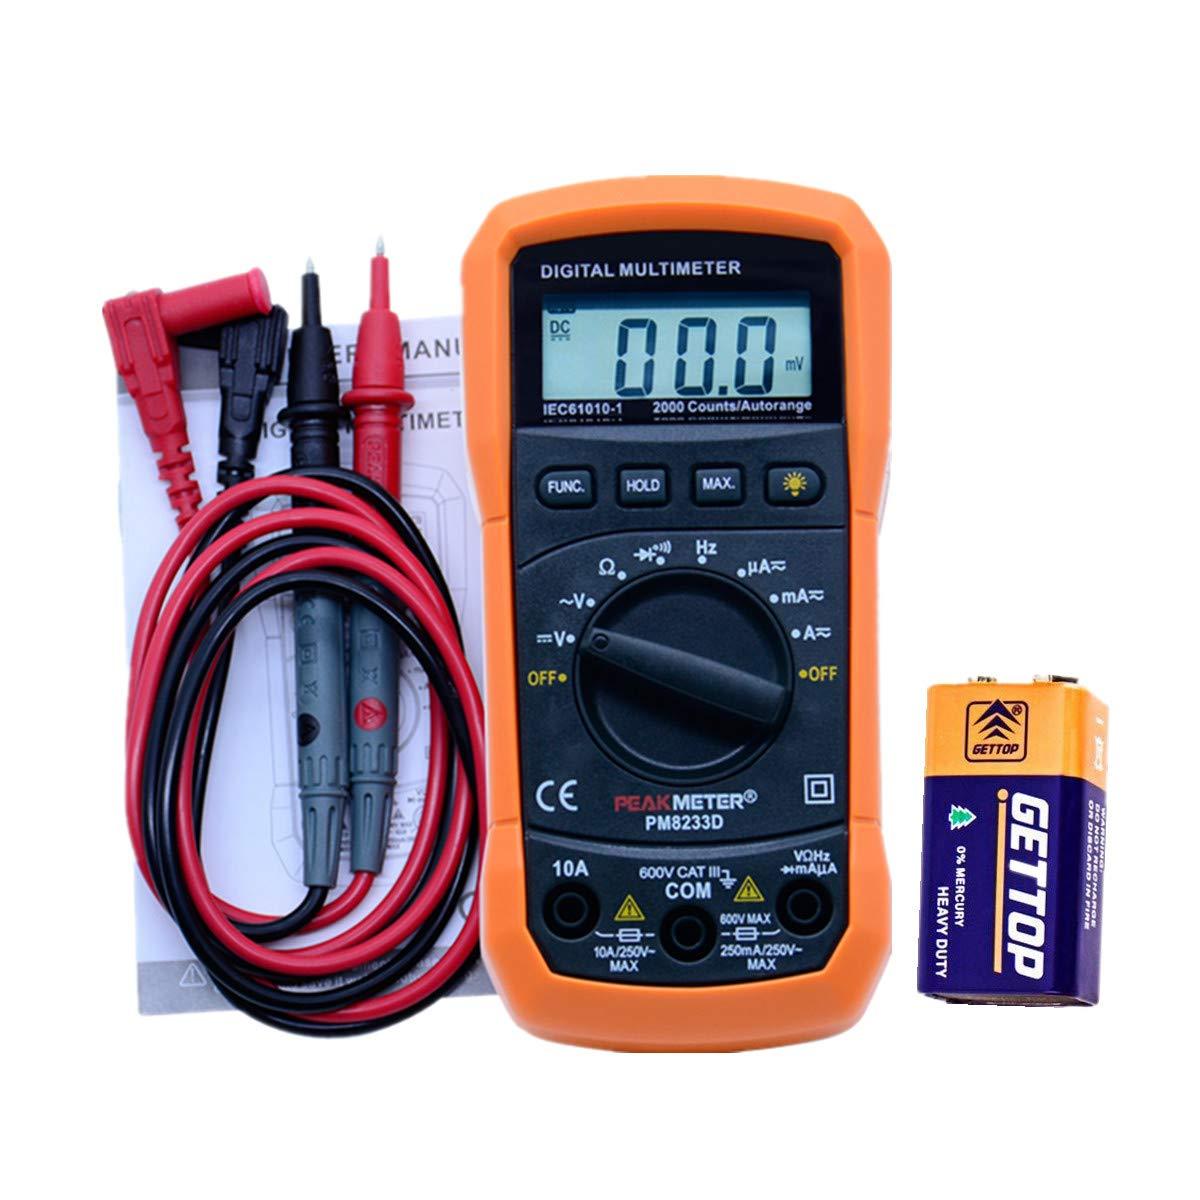 Digital Multimeter Electronic Measuring Test Meter Multi Tester Portable Voltmeter Voltage Tester Measurement Tool chuchuang